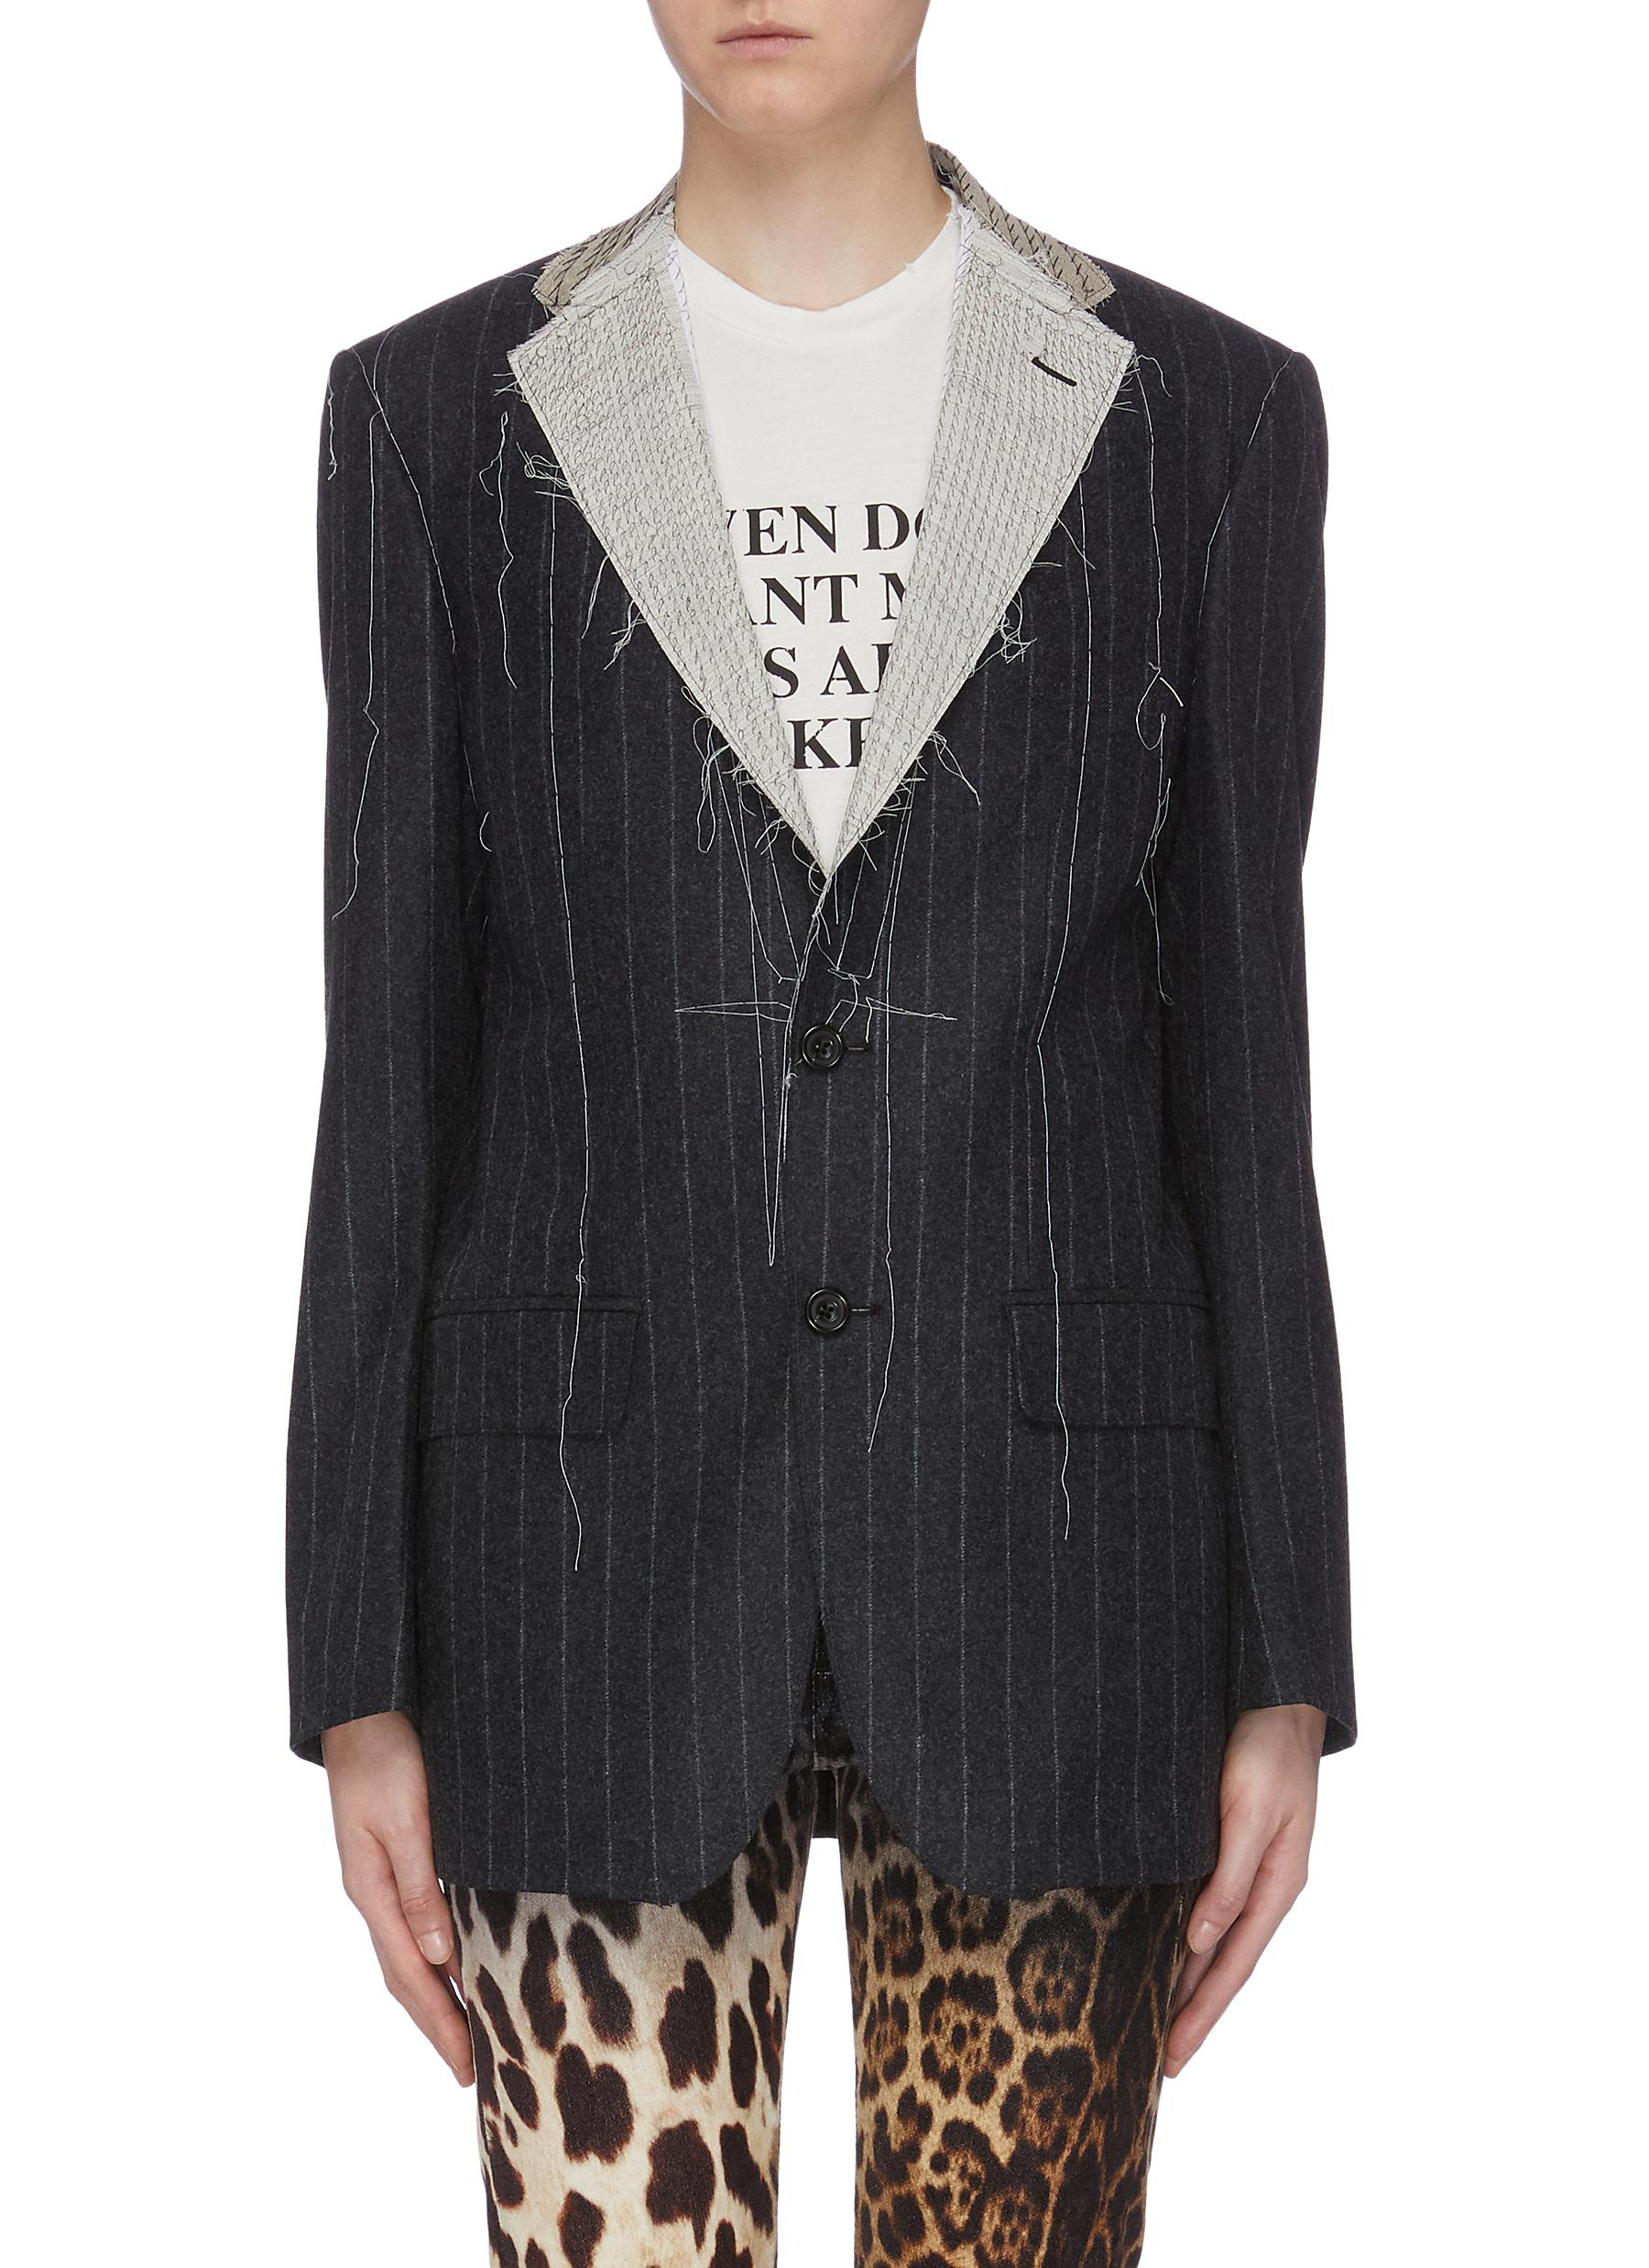 Distressed pinstripe blazer by R13